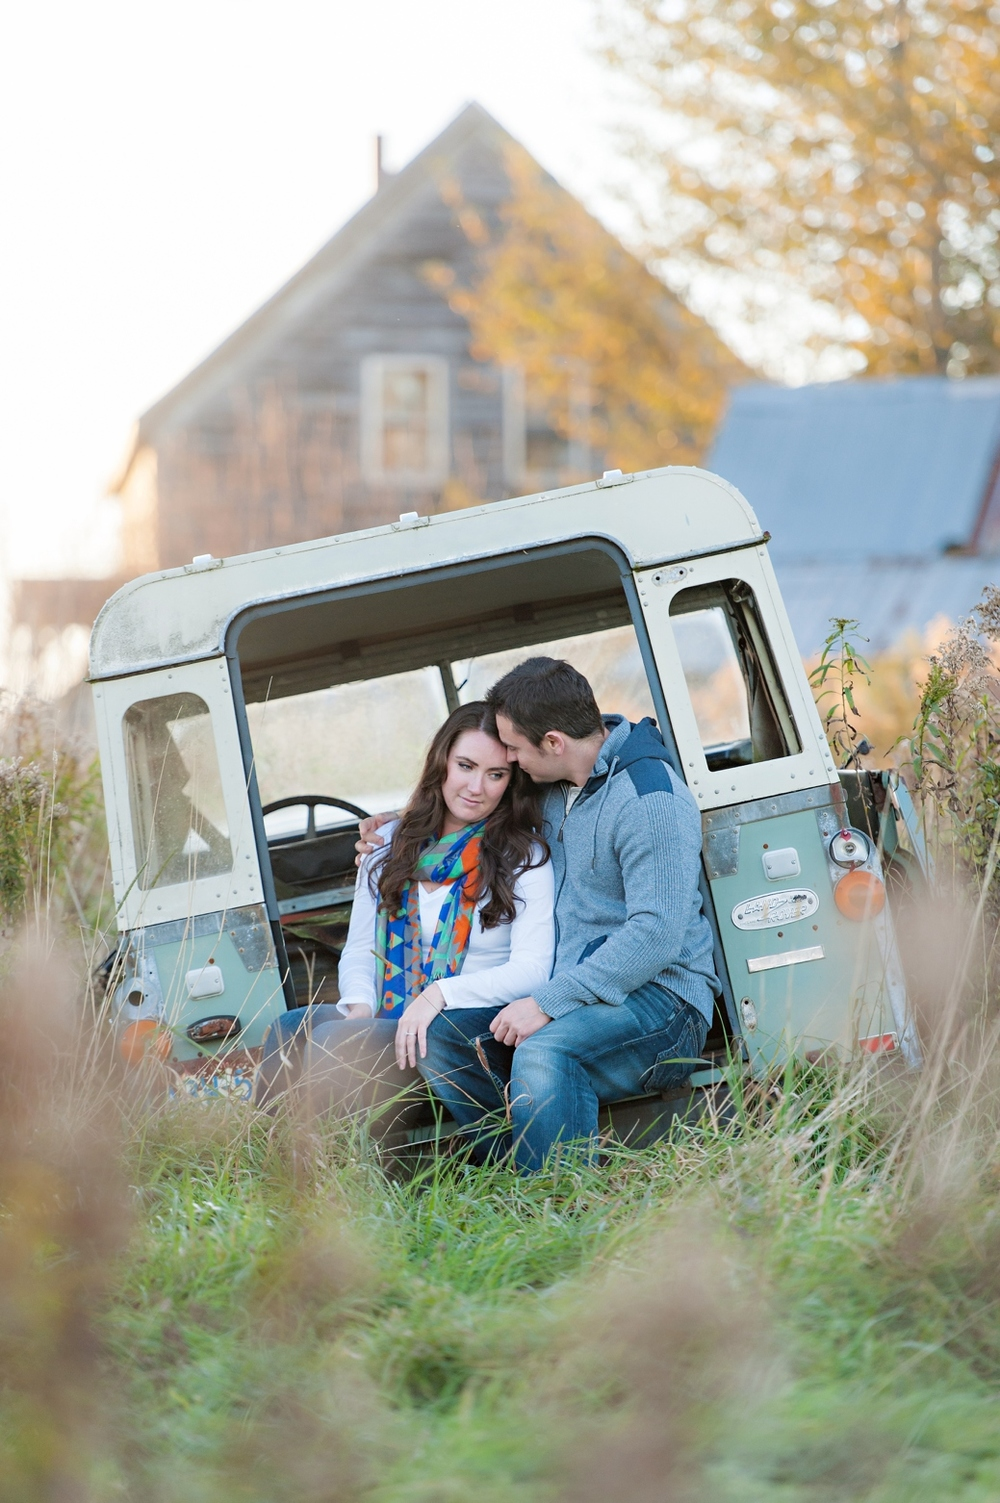 Abandoned-Farm-Engagement-Halifax-Engagment-Fall-Engagement-Photos068.jpg